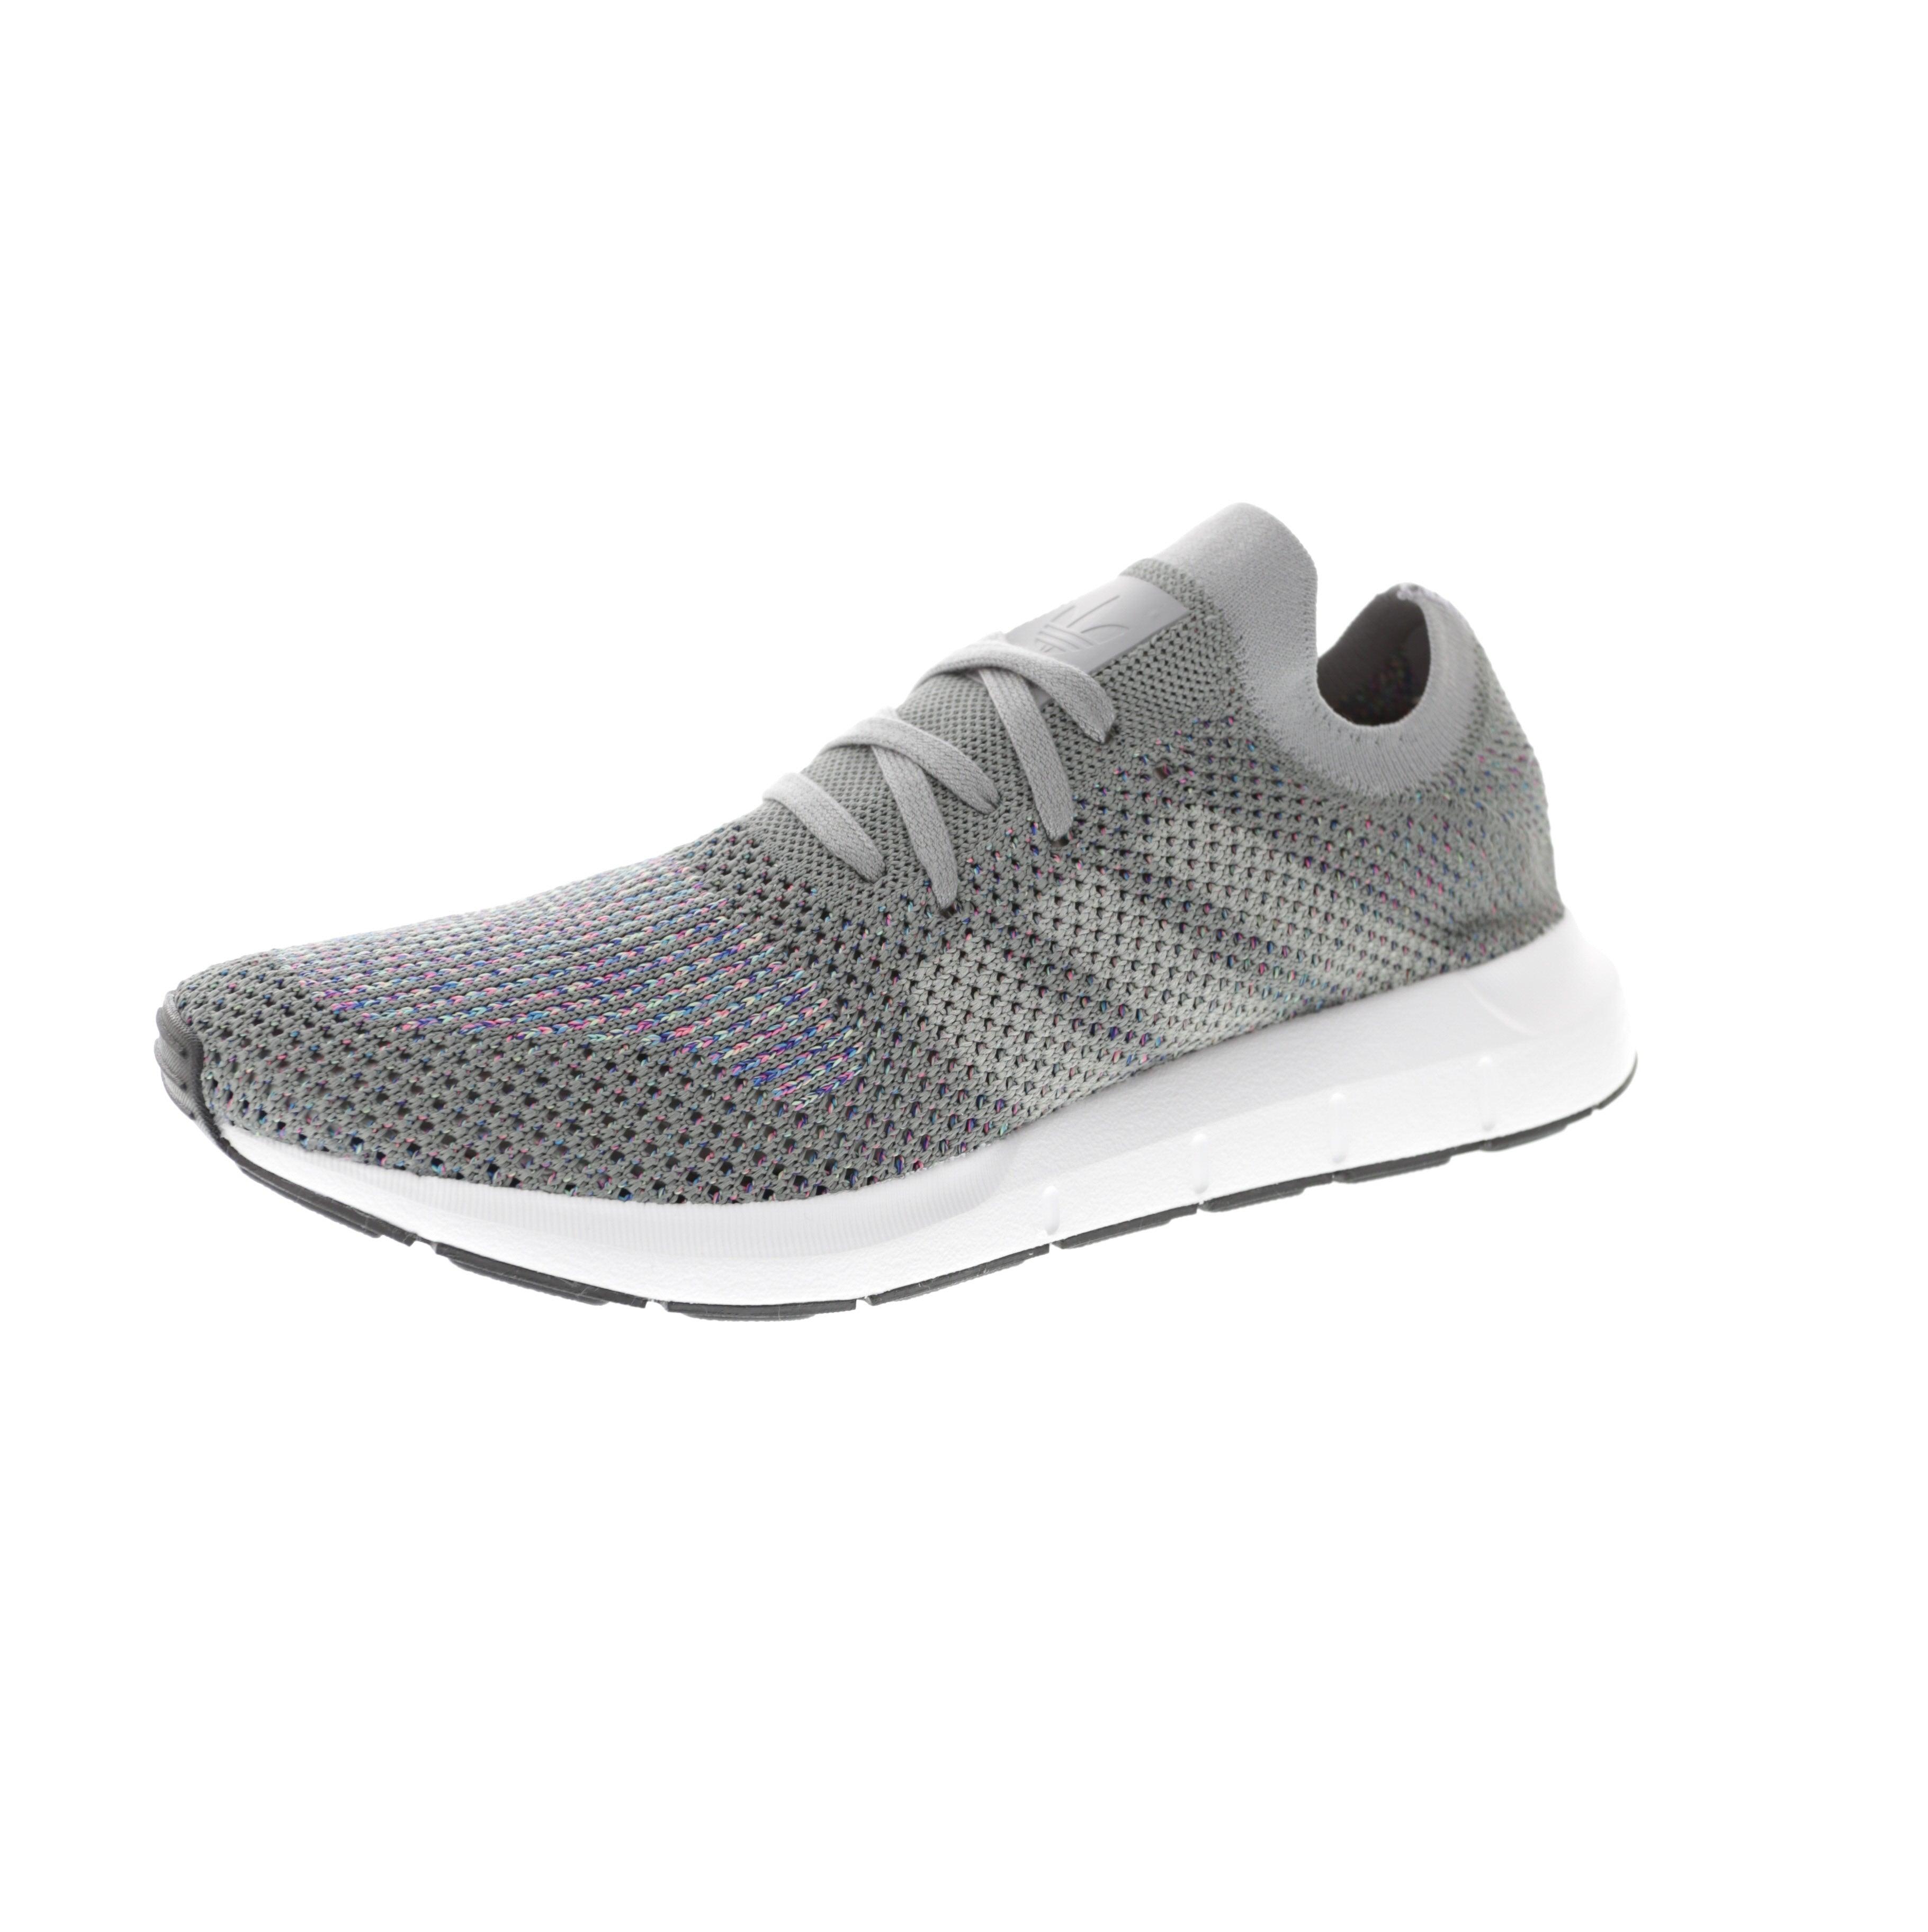 Adidas Originals Swift Run Primeknit GreyWhiteBlack